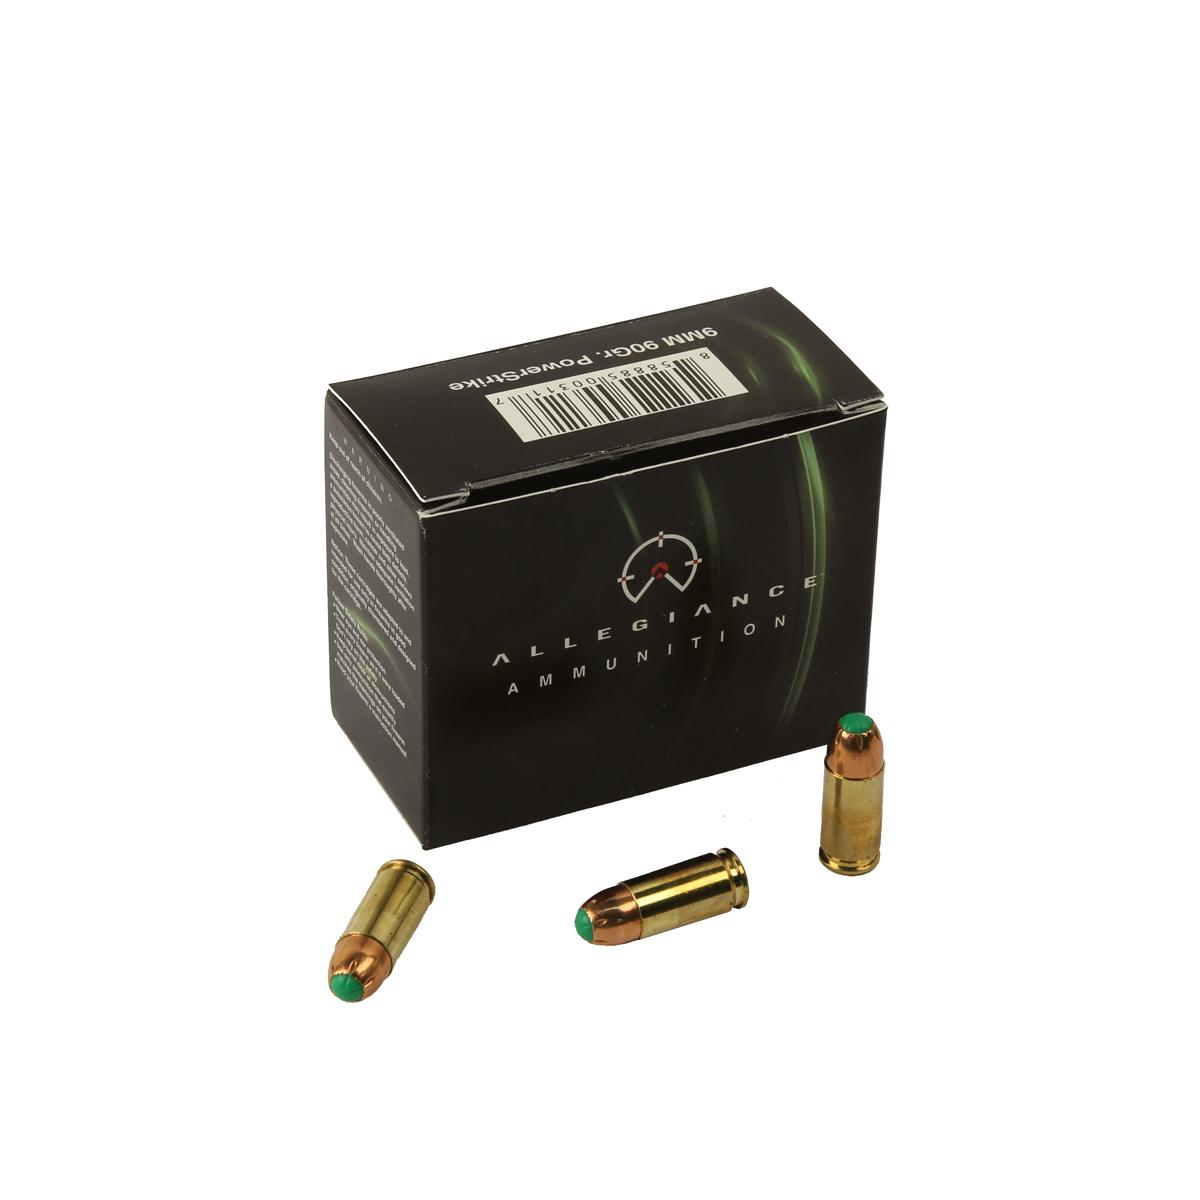 Allegiance Ammunition 9mm Luger 90 GR. PowerStrike - 20RD